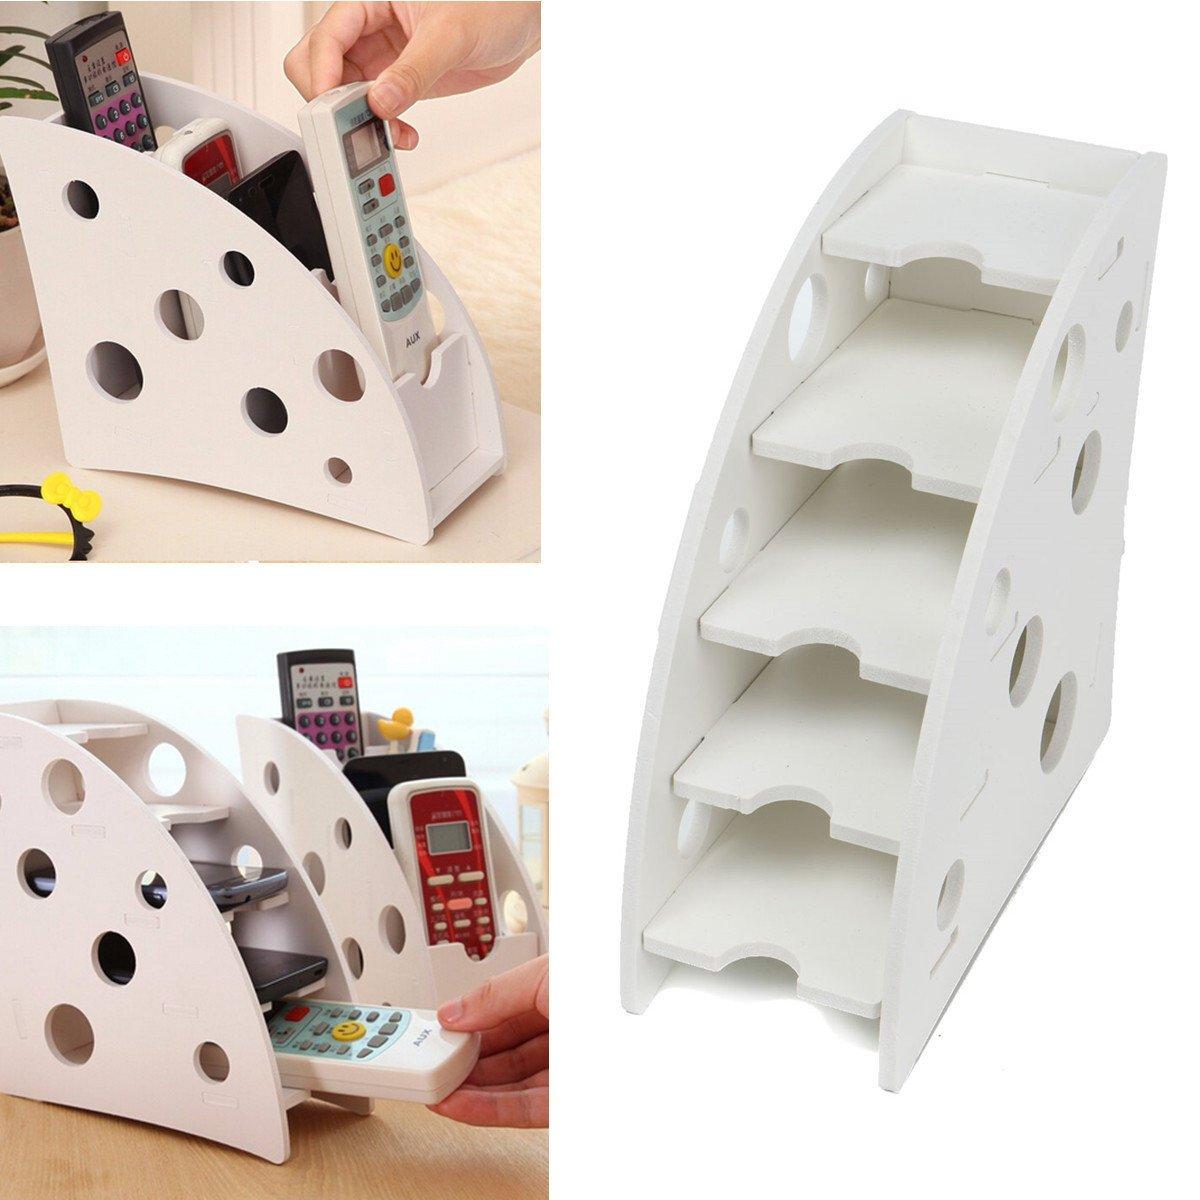 C&C Products Environmentally Wood Plastic Board Pen Phone TV Remote Control Holder Desktop Decal Decoration DIY Storage Box